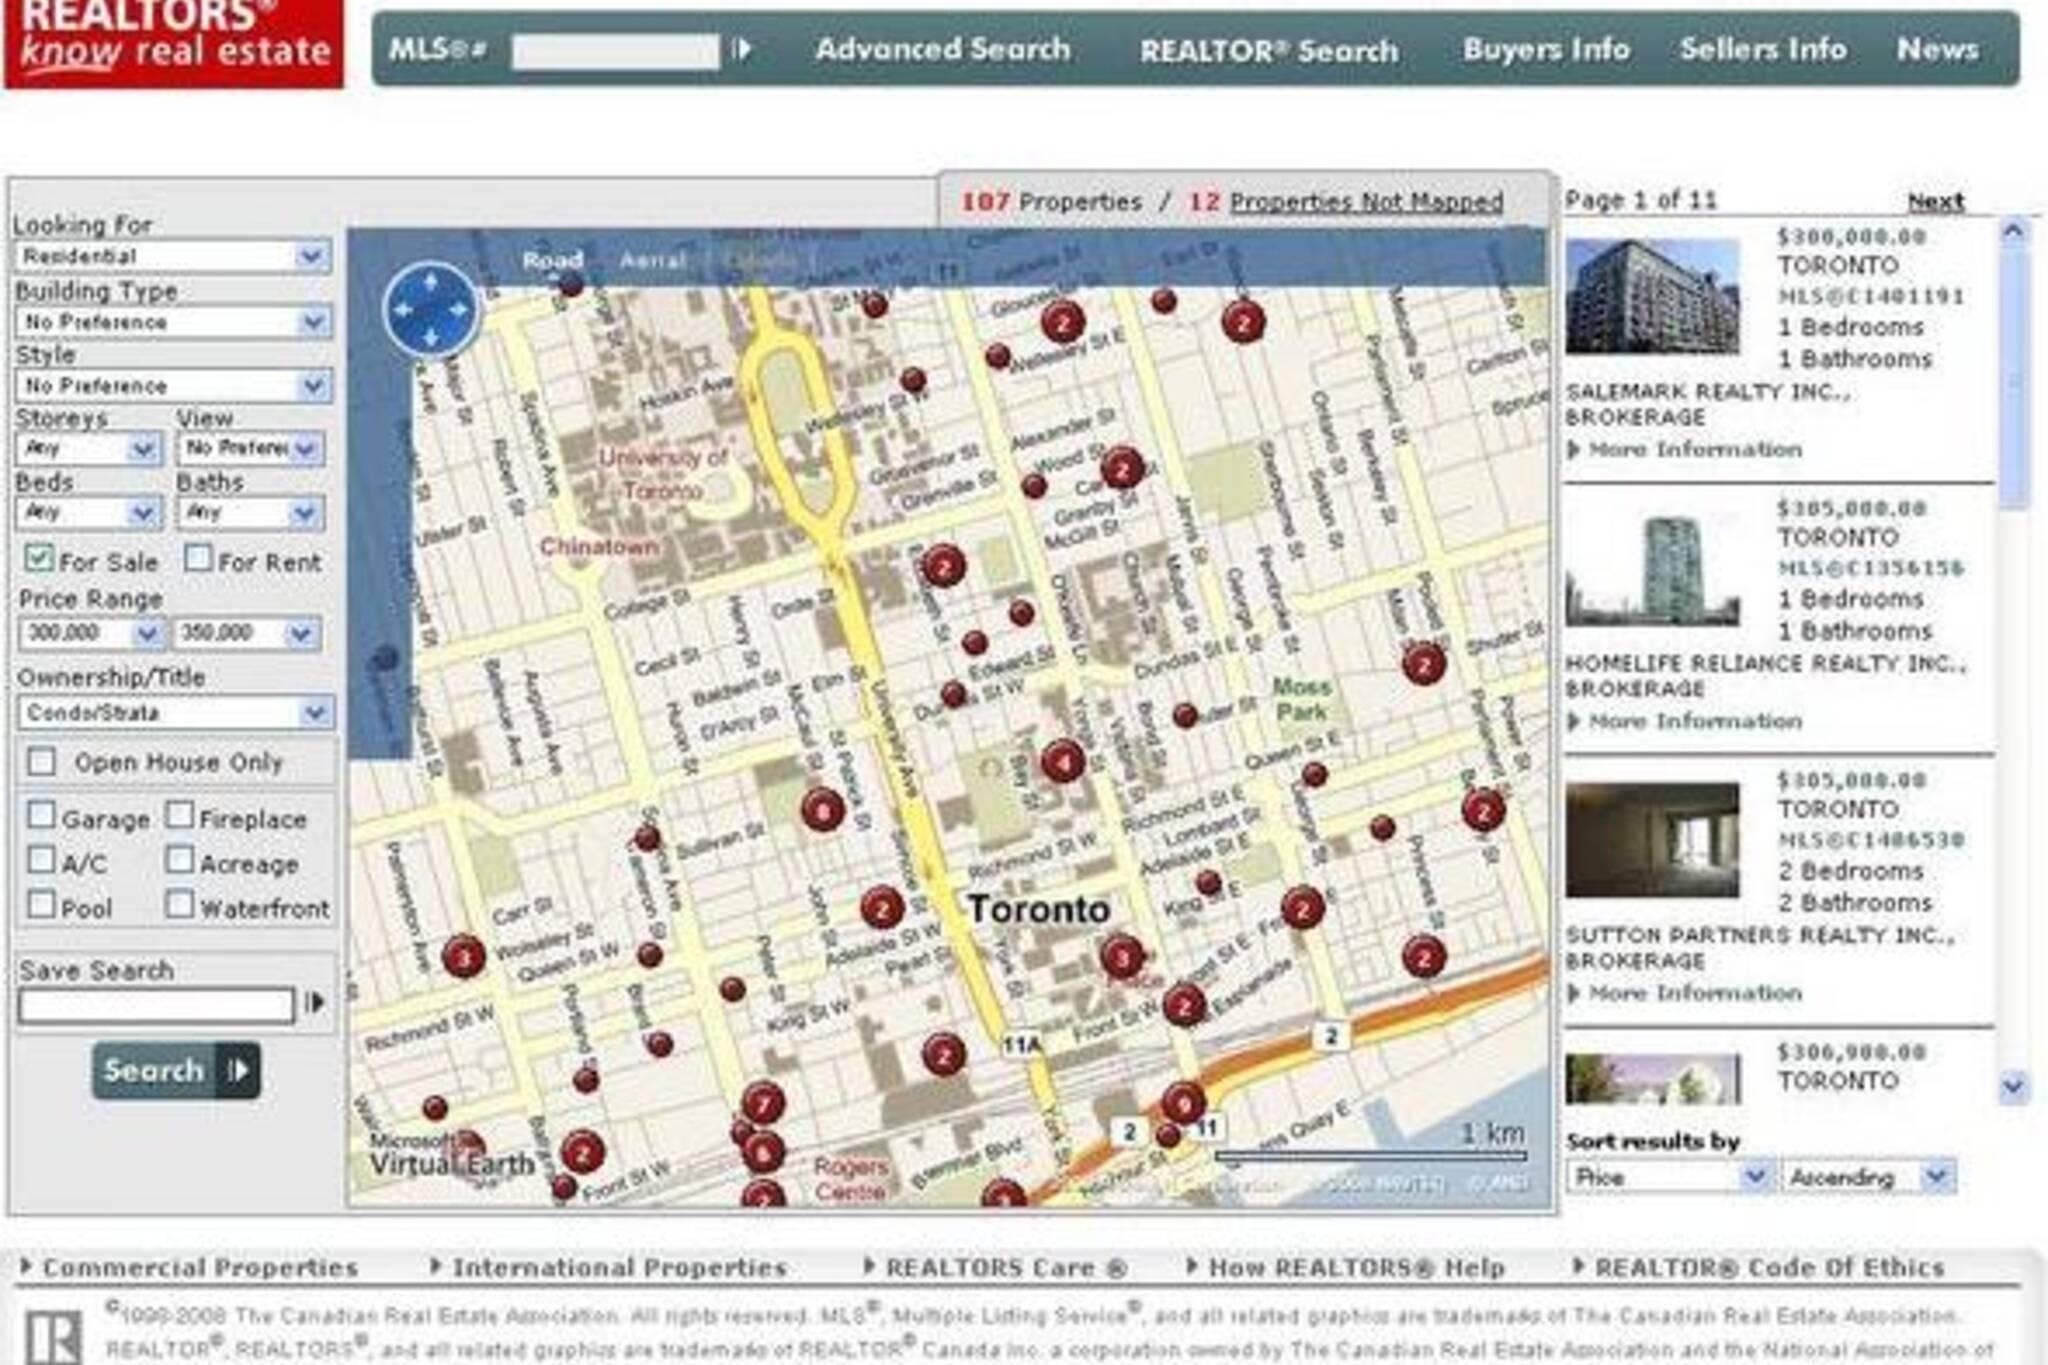 realtor.ca screenshot 590.jpg